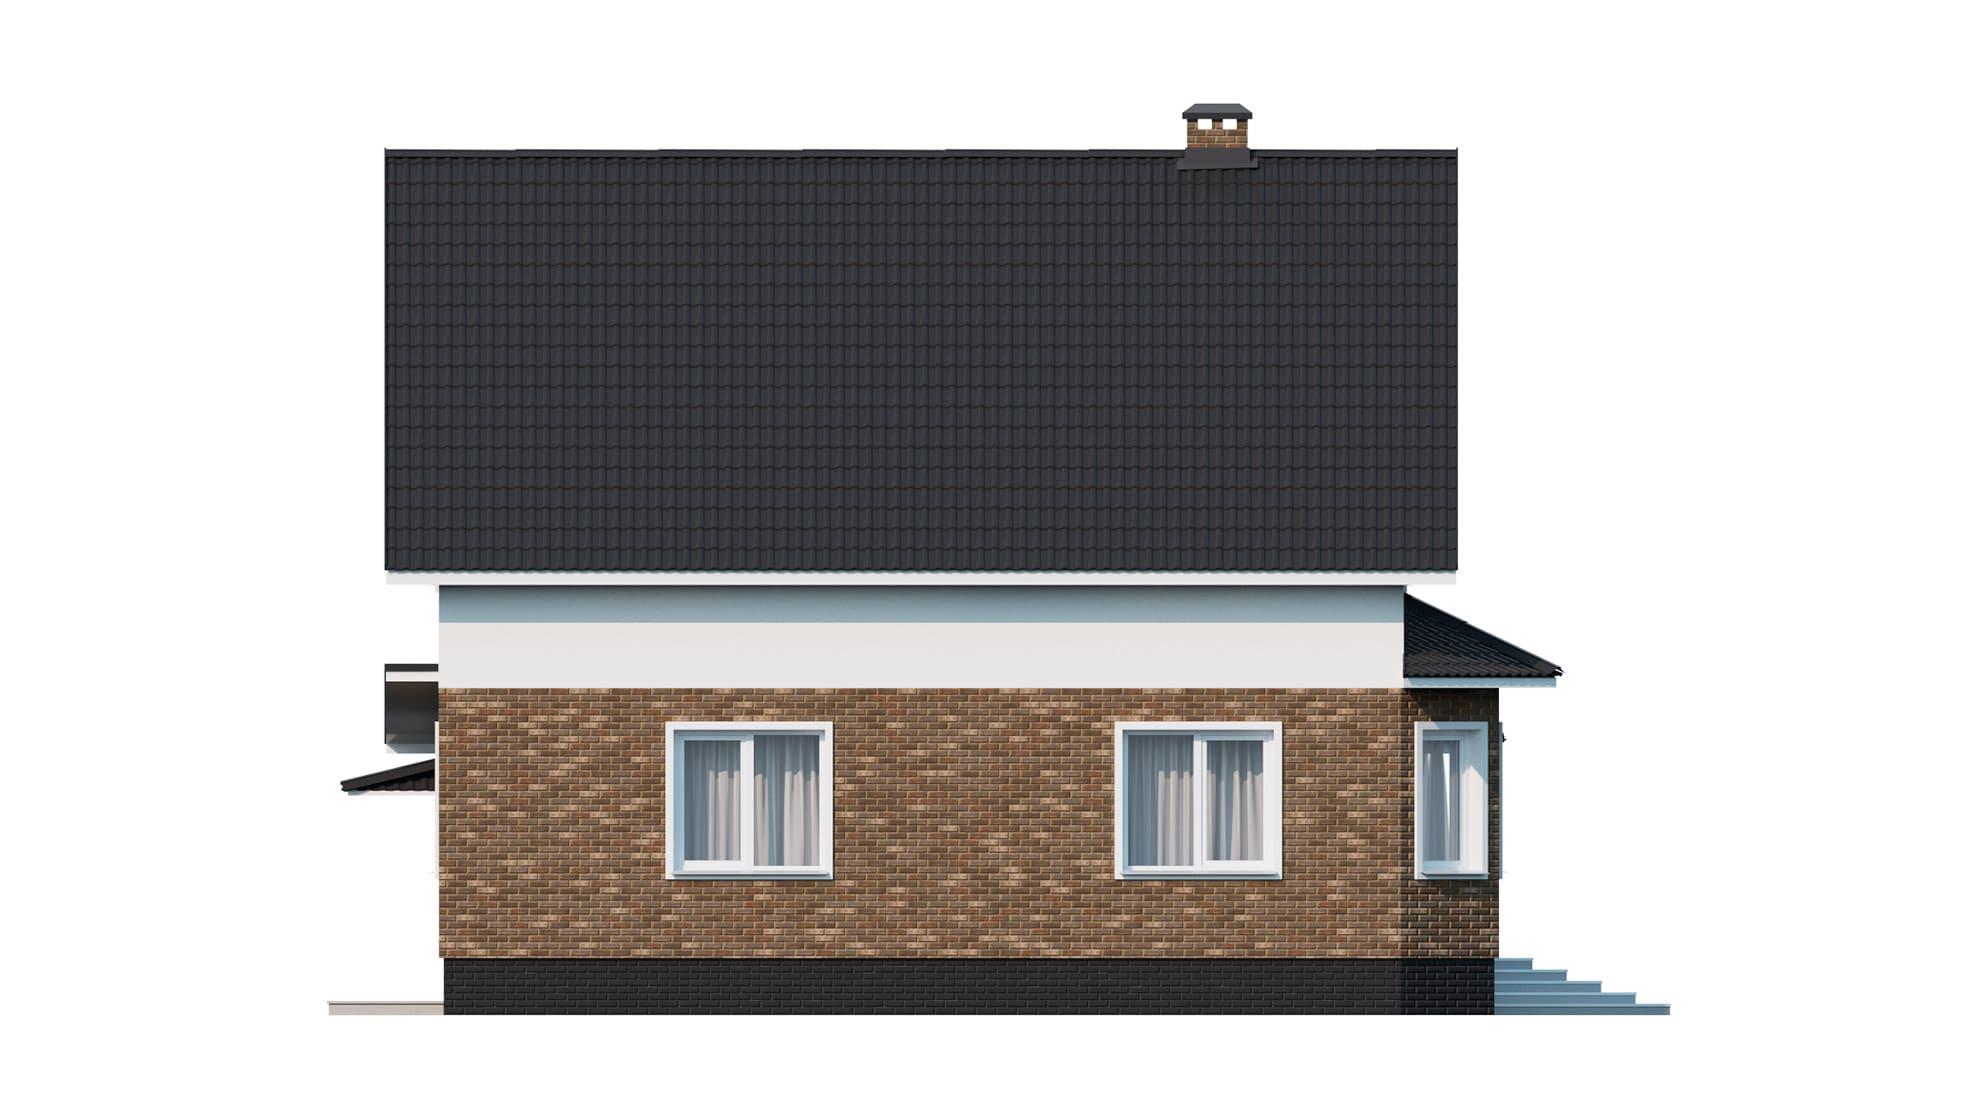 Фасад мансардного дома с гаражом «КМ-9» - слева